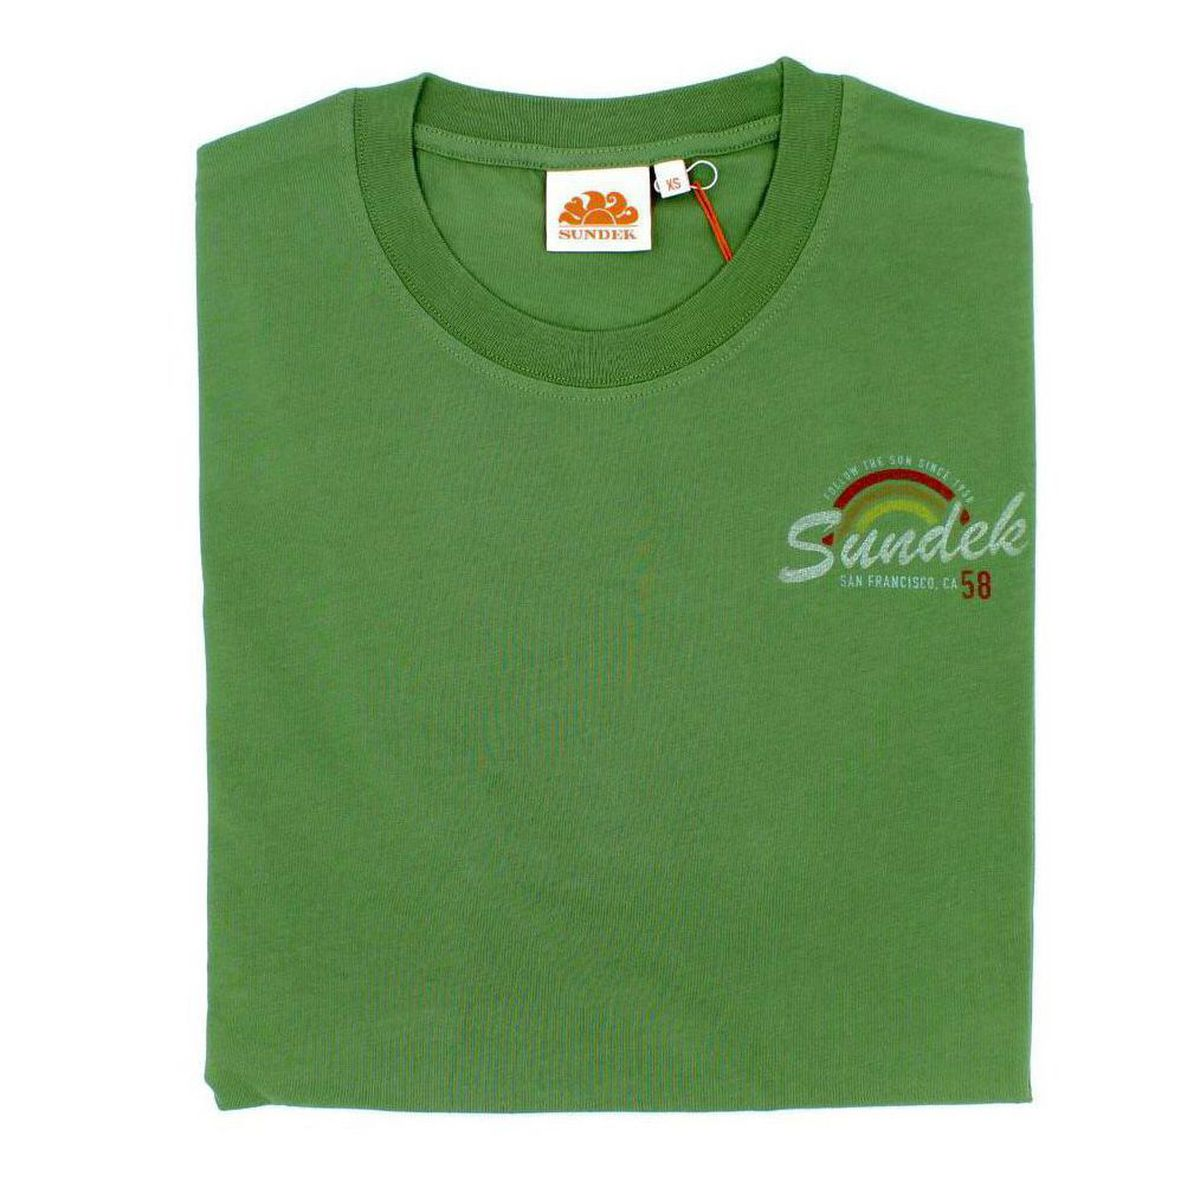 1. San Francisco rainbow t-shirt Amazon green Sundek